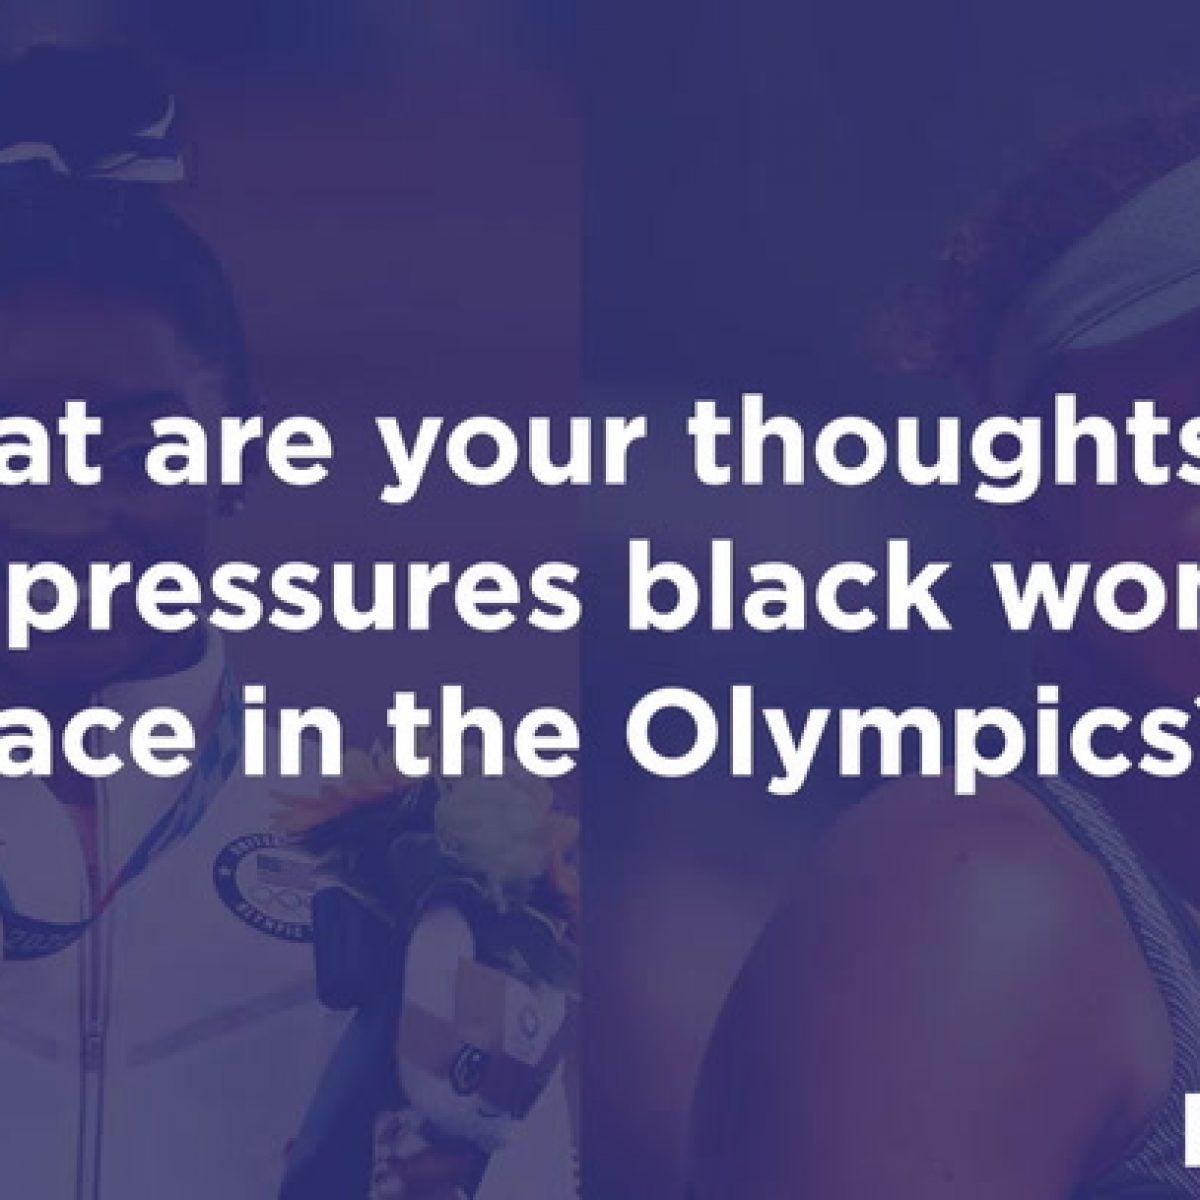 Ear To The Street  Pressure Black Women Face Teaser